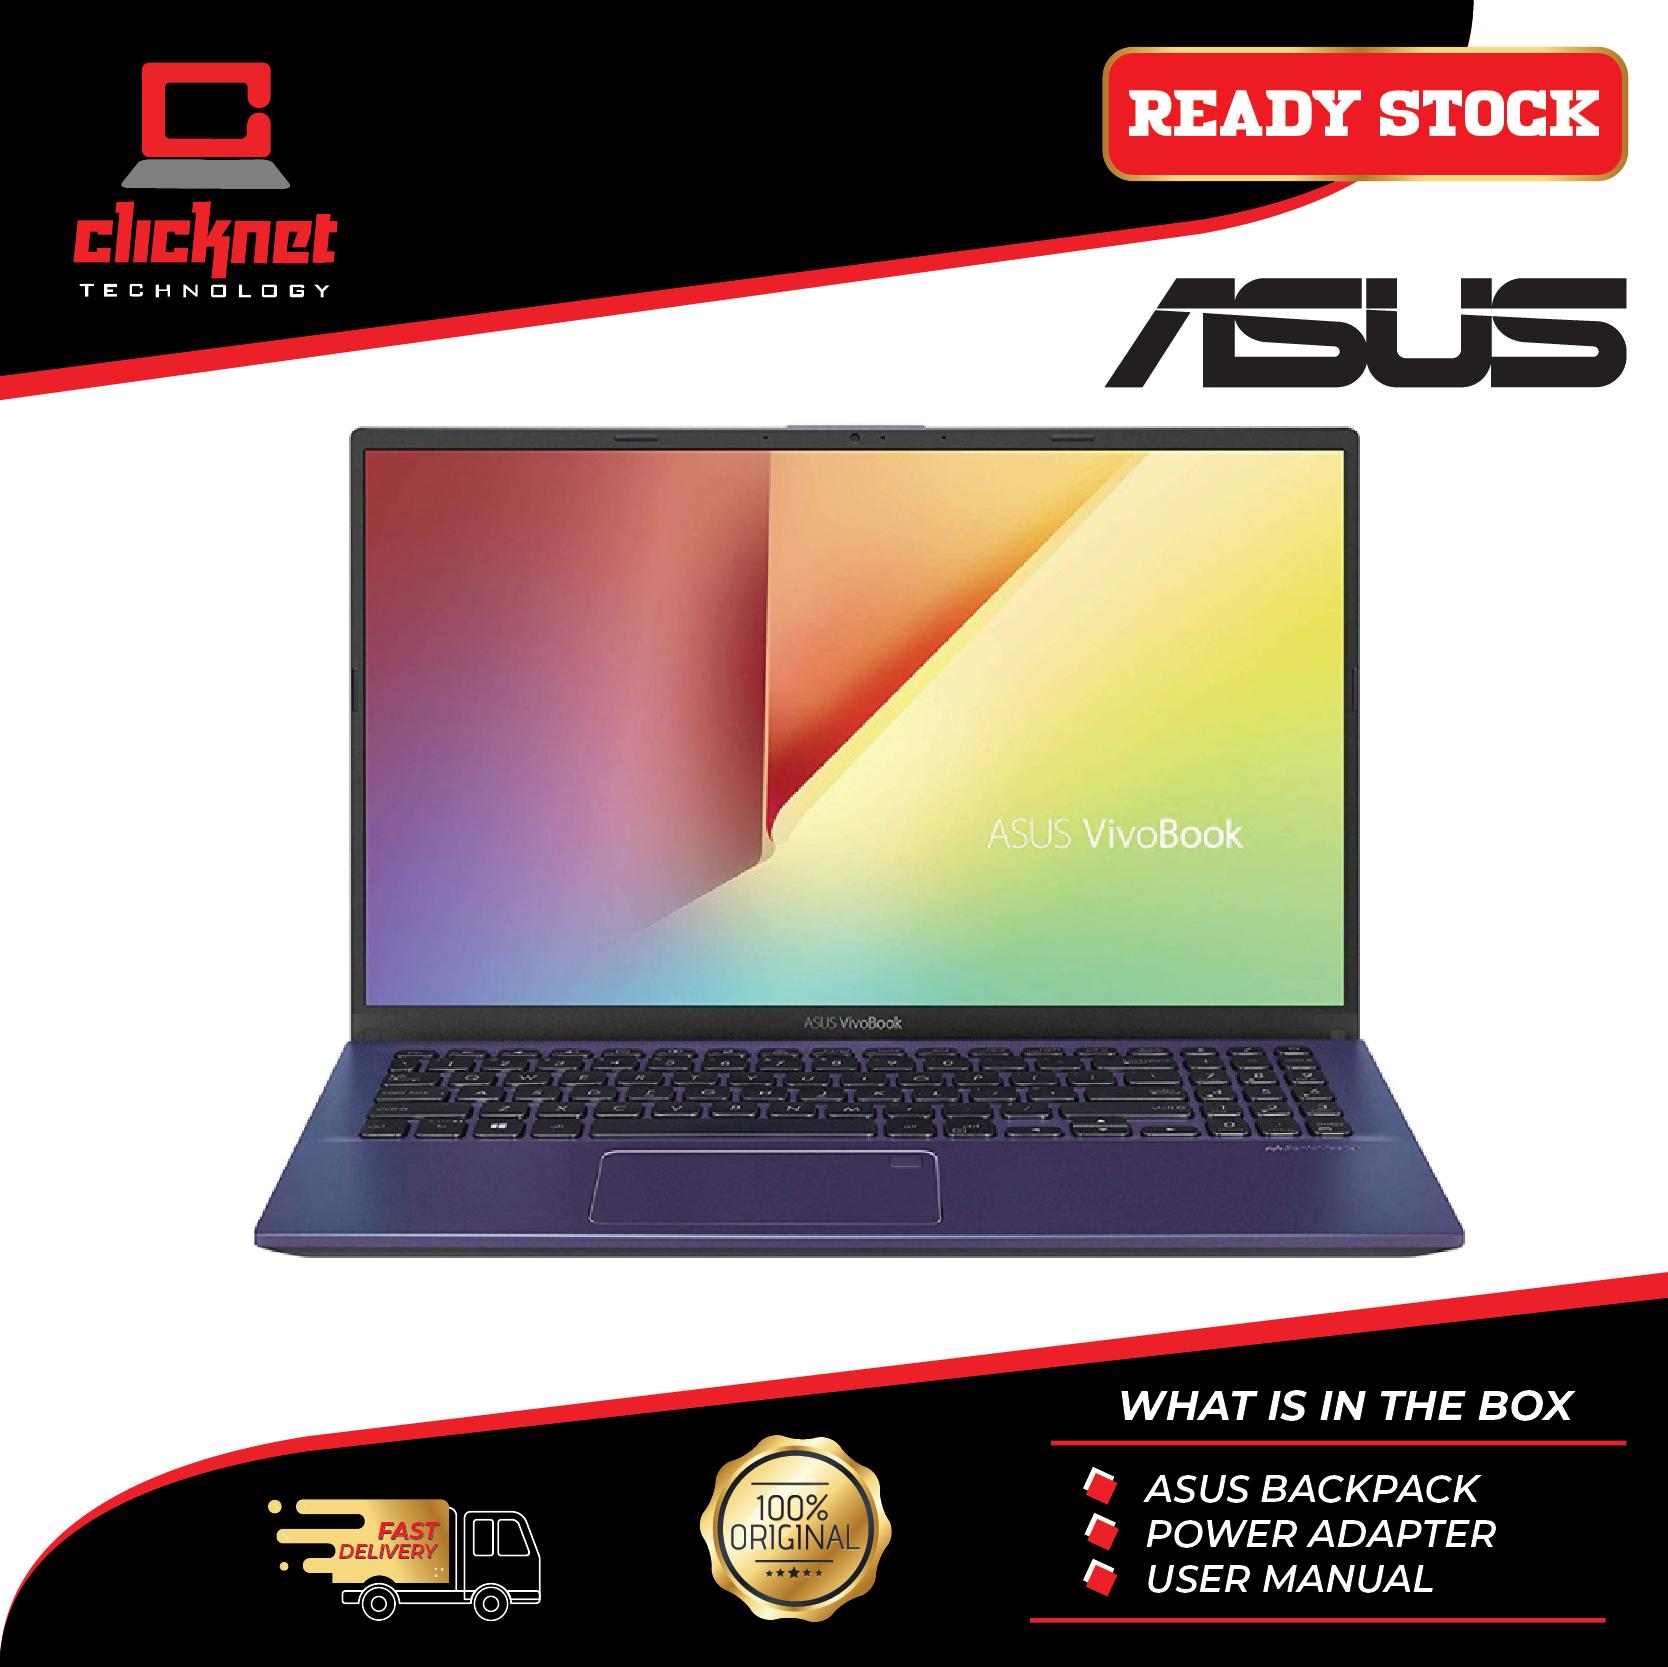 Asus Laptop Vivobook A512D-AEJ1069T 15.6  FHD Peacock Blue (Ryzen 5-3500U, 4GB, 512GB SSD, ATI, W10) Malaysia